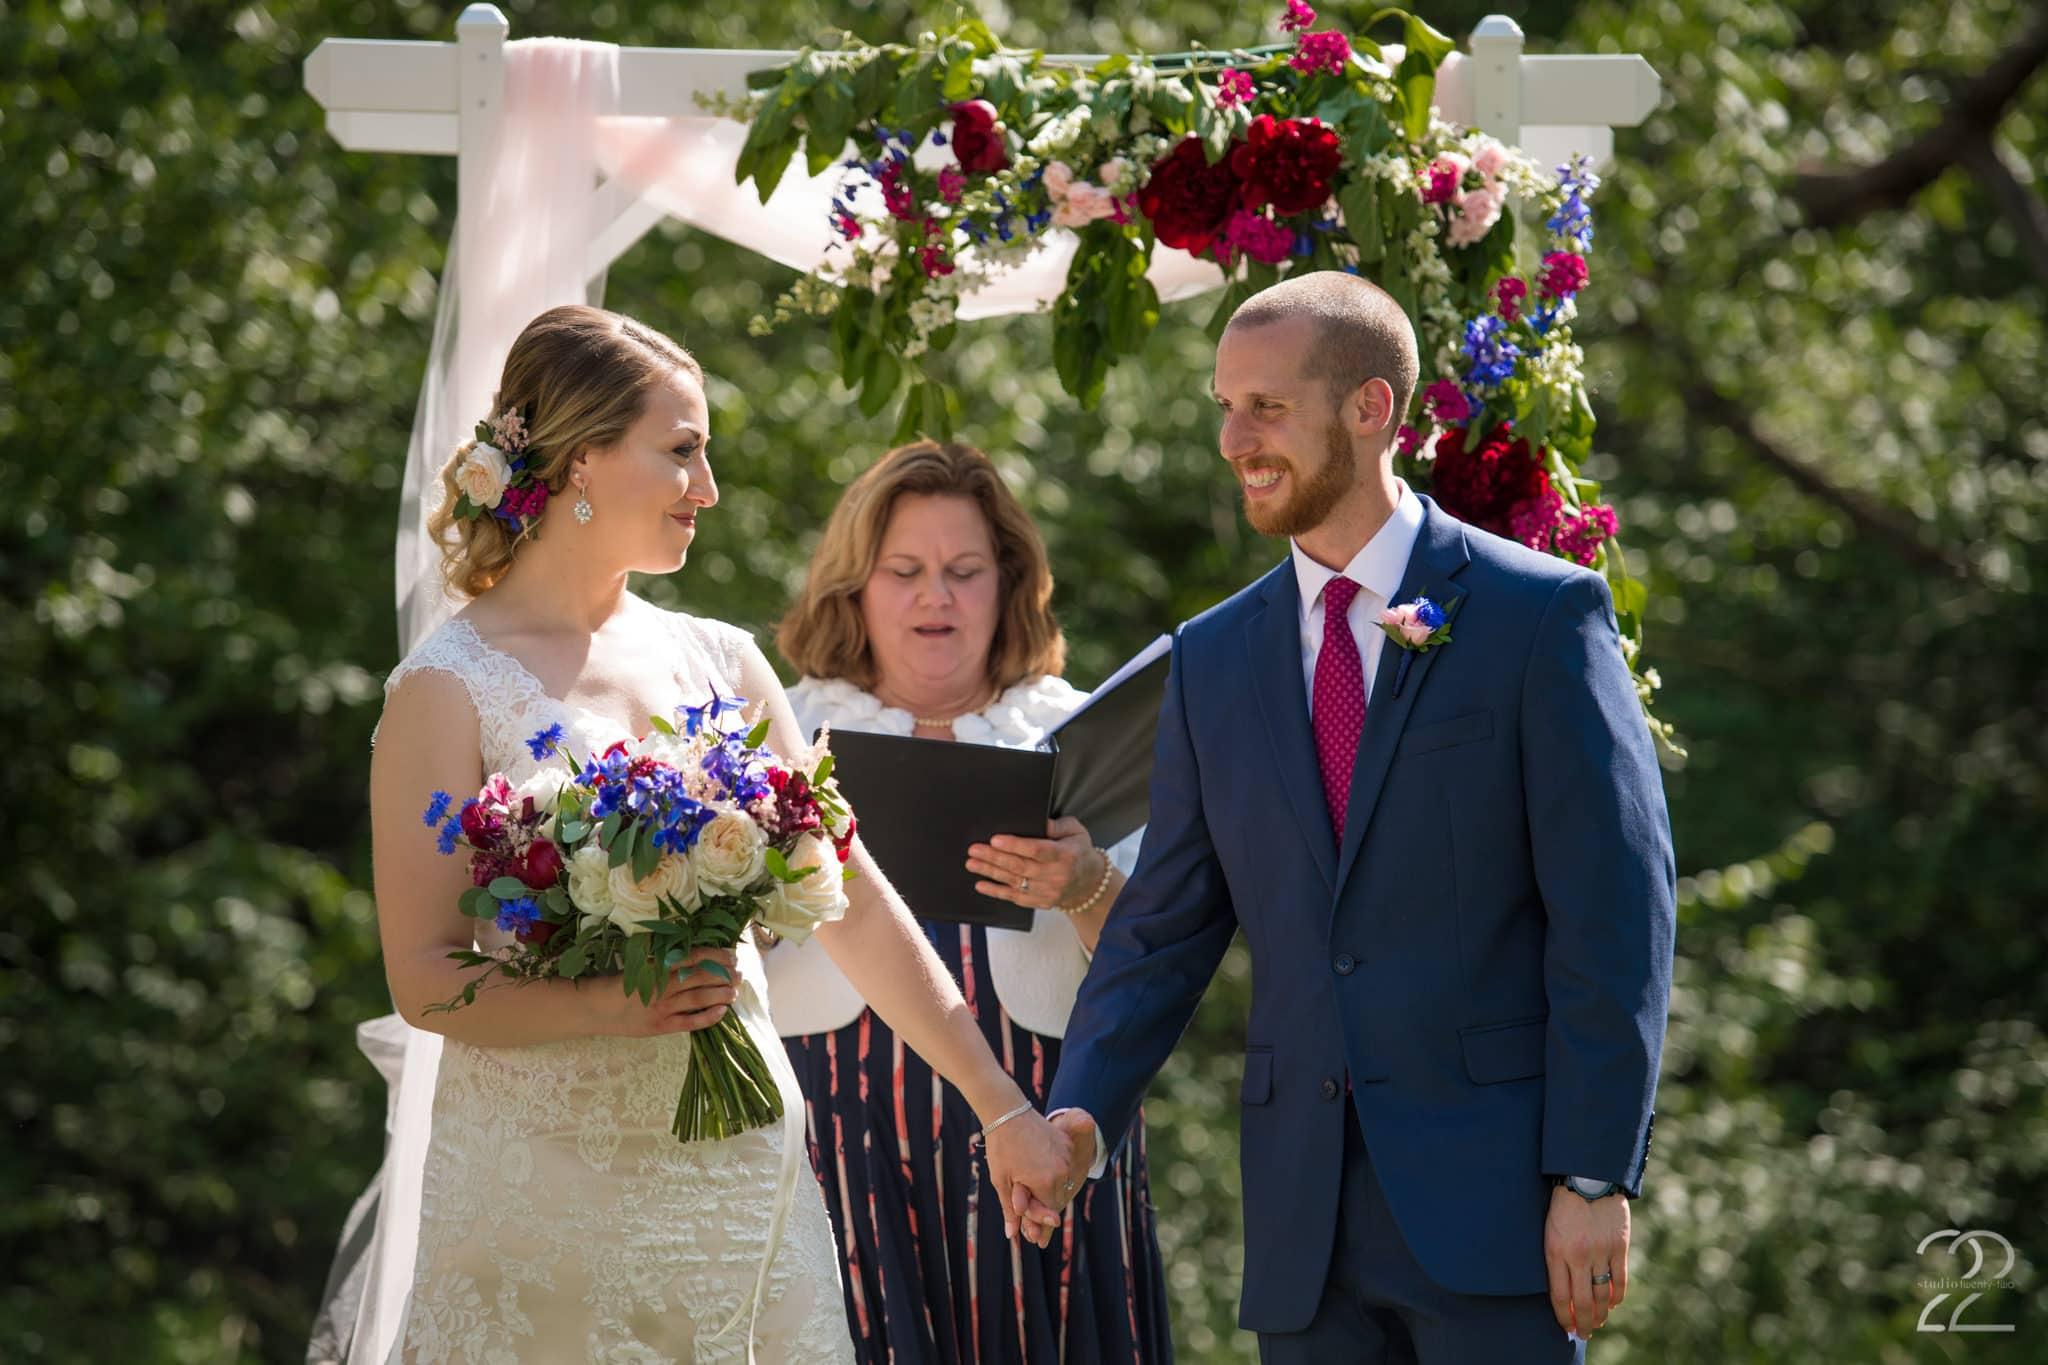 Outdoor Wedding Venues in Dayton - Canopy Creek Farm